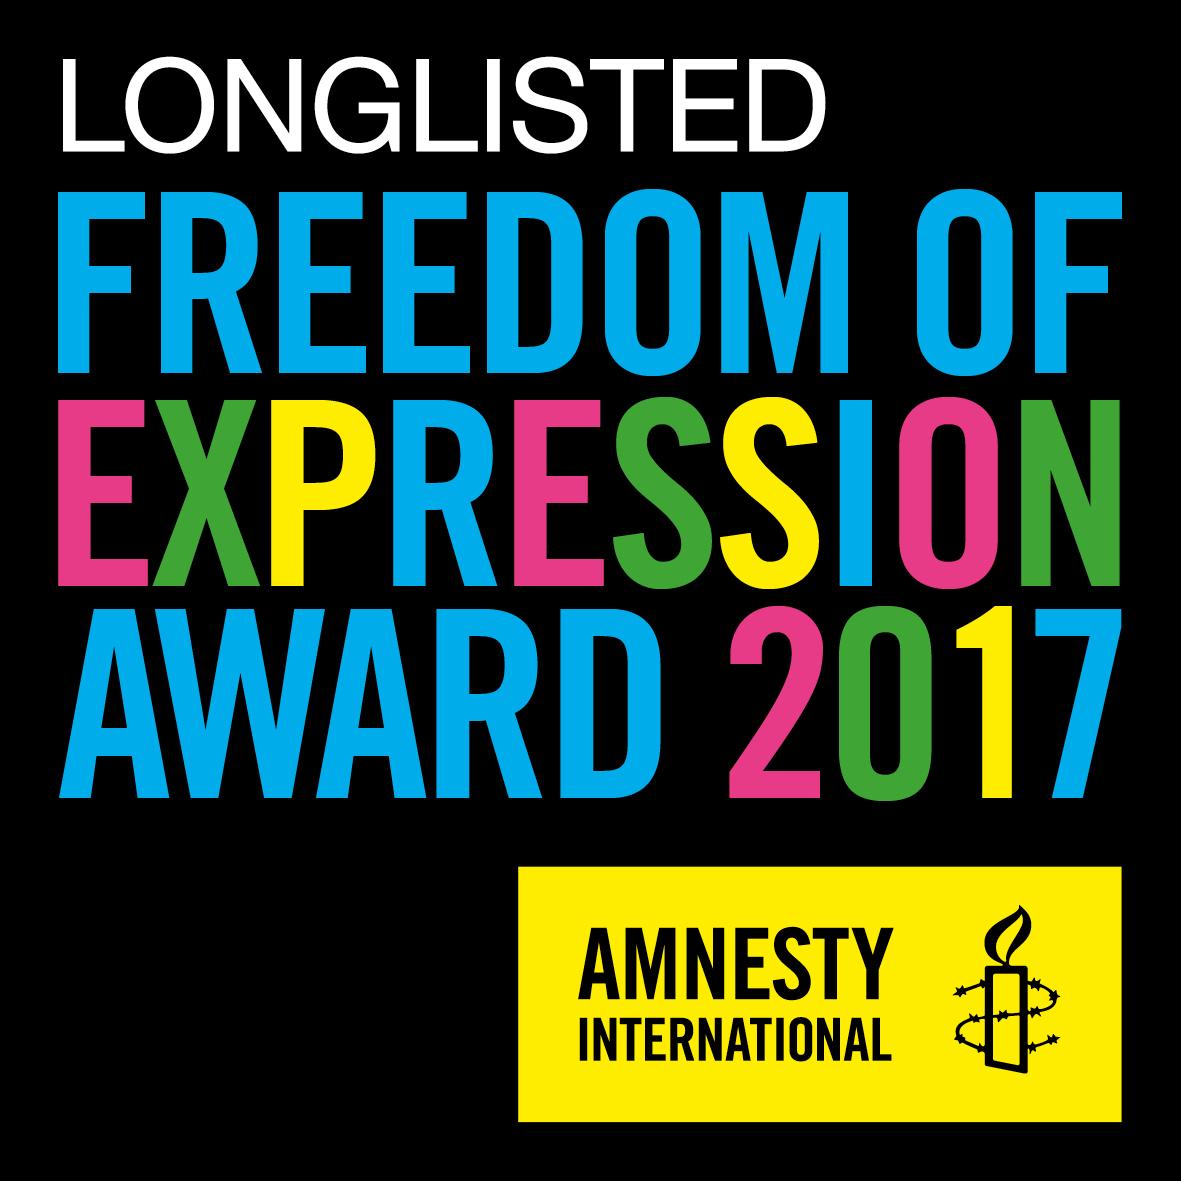 The Amnesty International Freedom of Expression Award logo.